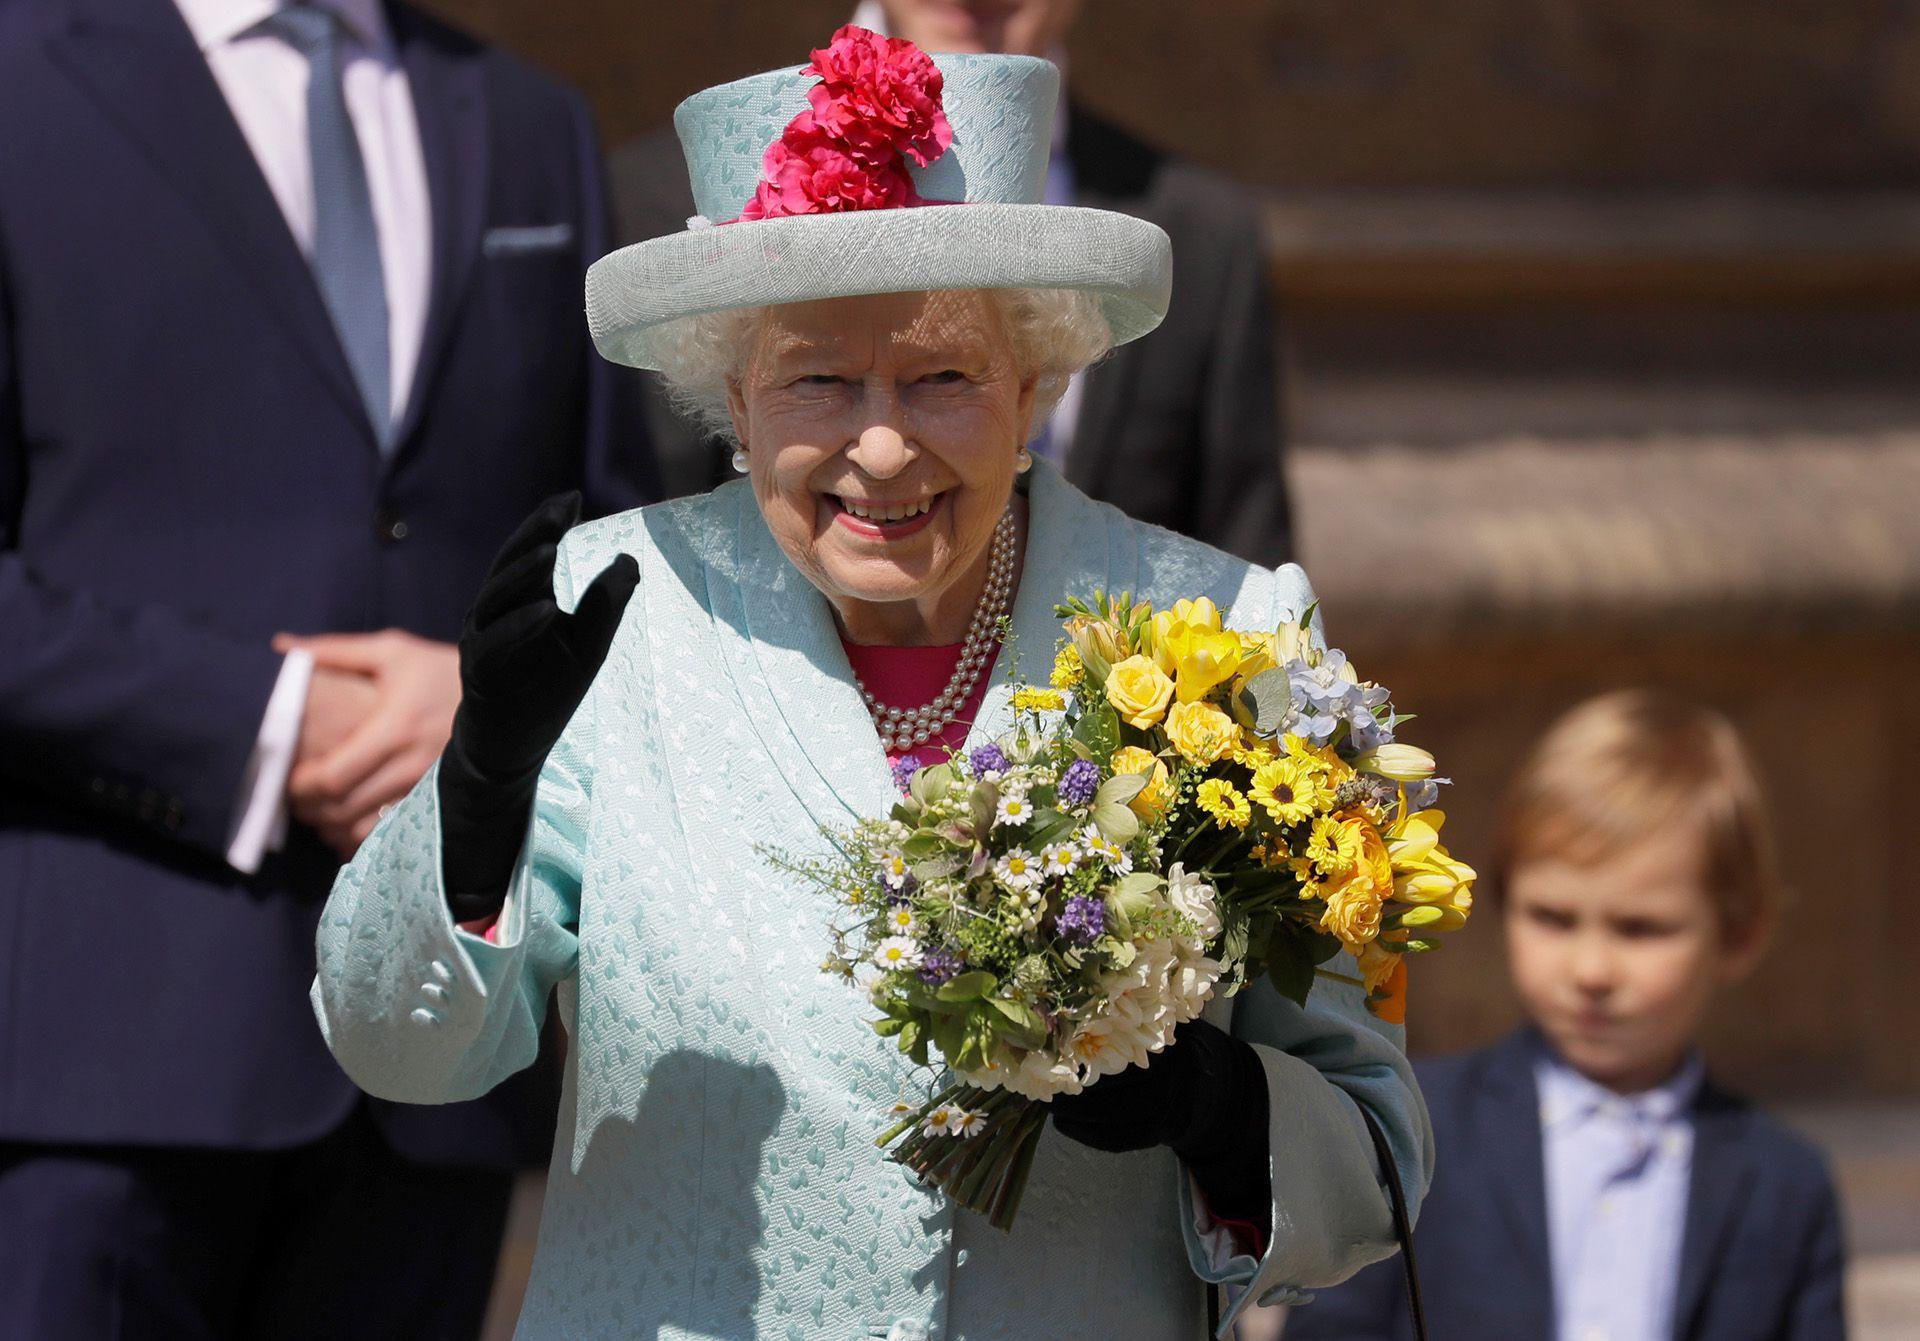 La Reina Isabel II asiste al Servicio de Pascua en la Capilla de San Jorge, en el Castillo de Windsor, el 21 de abril de 2019 (Kirsty Wigglesworth/Pool via REUTERS)